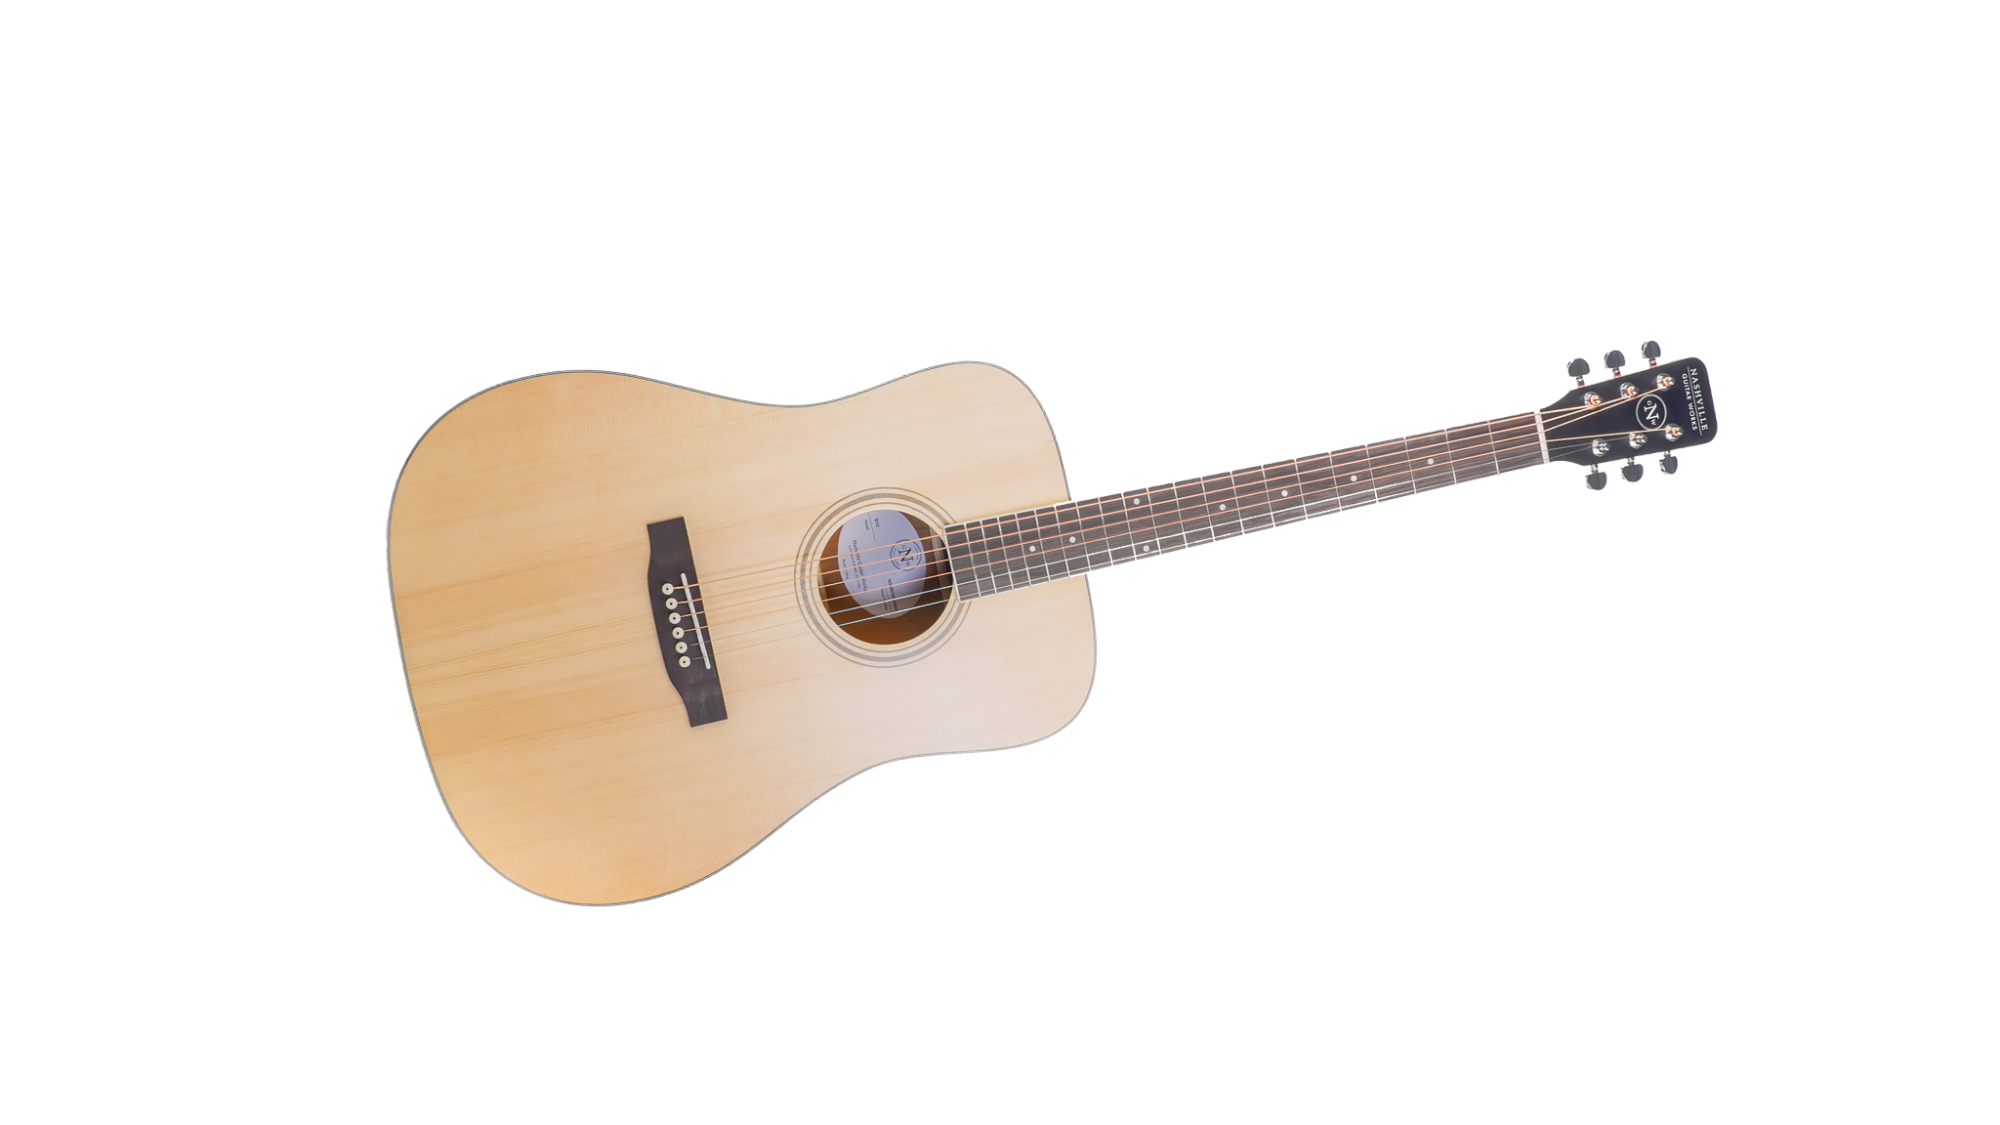 NGW D10 Dreadnought Acoustic Guitar-Natural